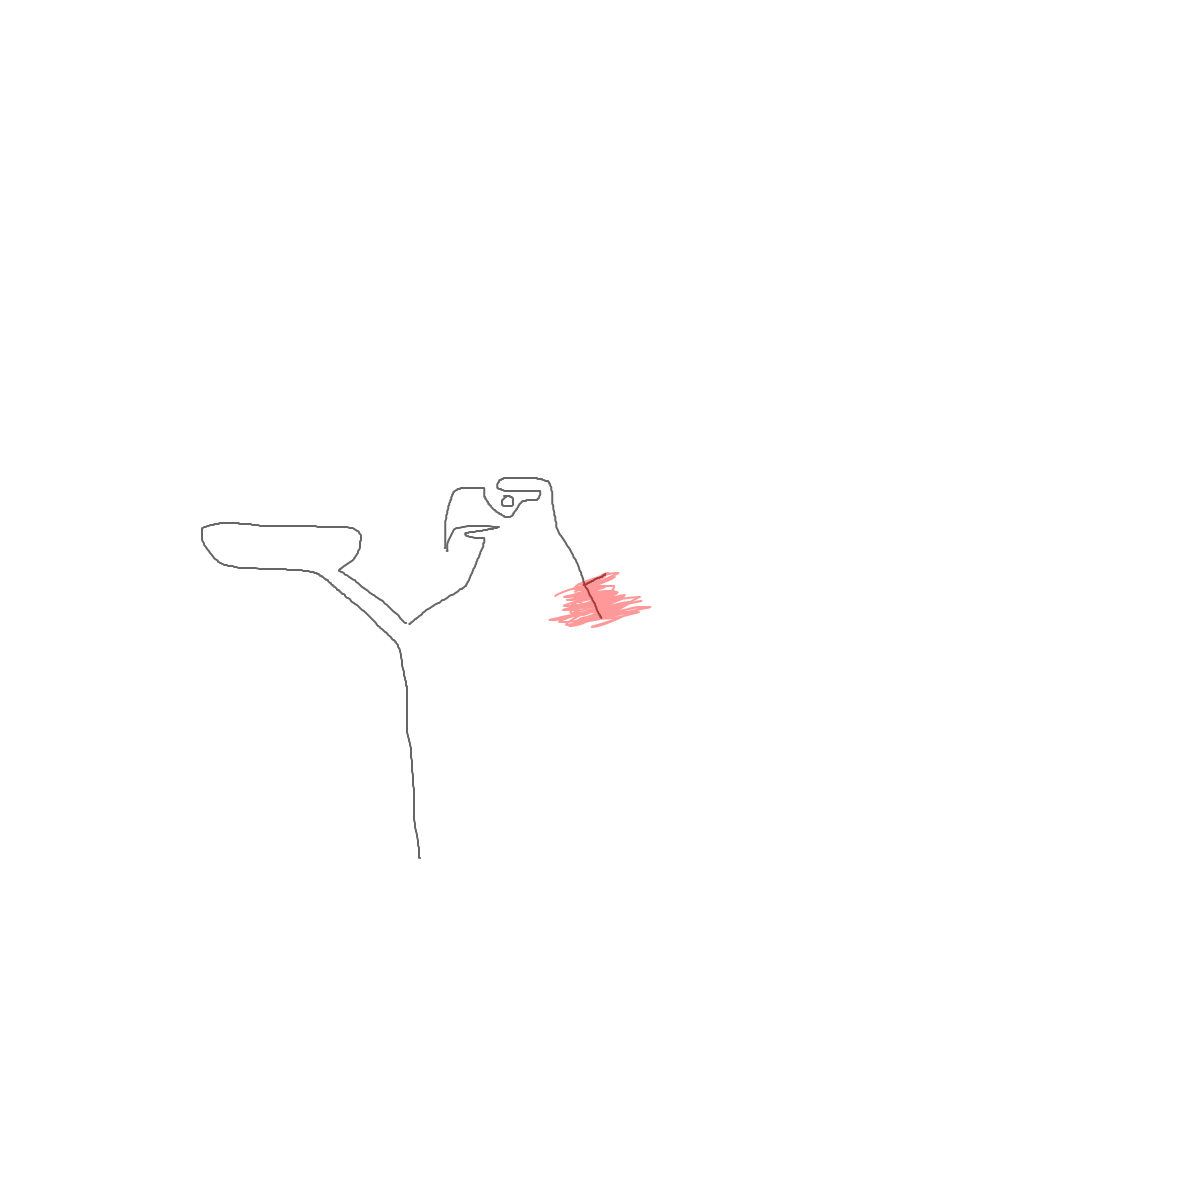 BAAAM drawing#19126 lat:60.3900756835937500lng: 25.6671028137207030